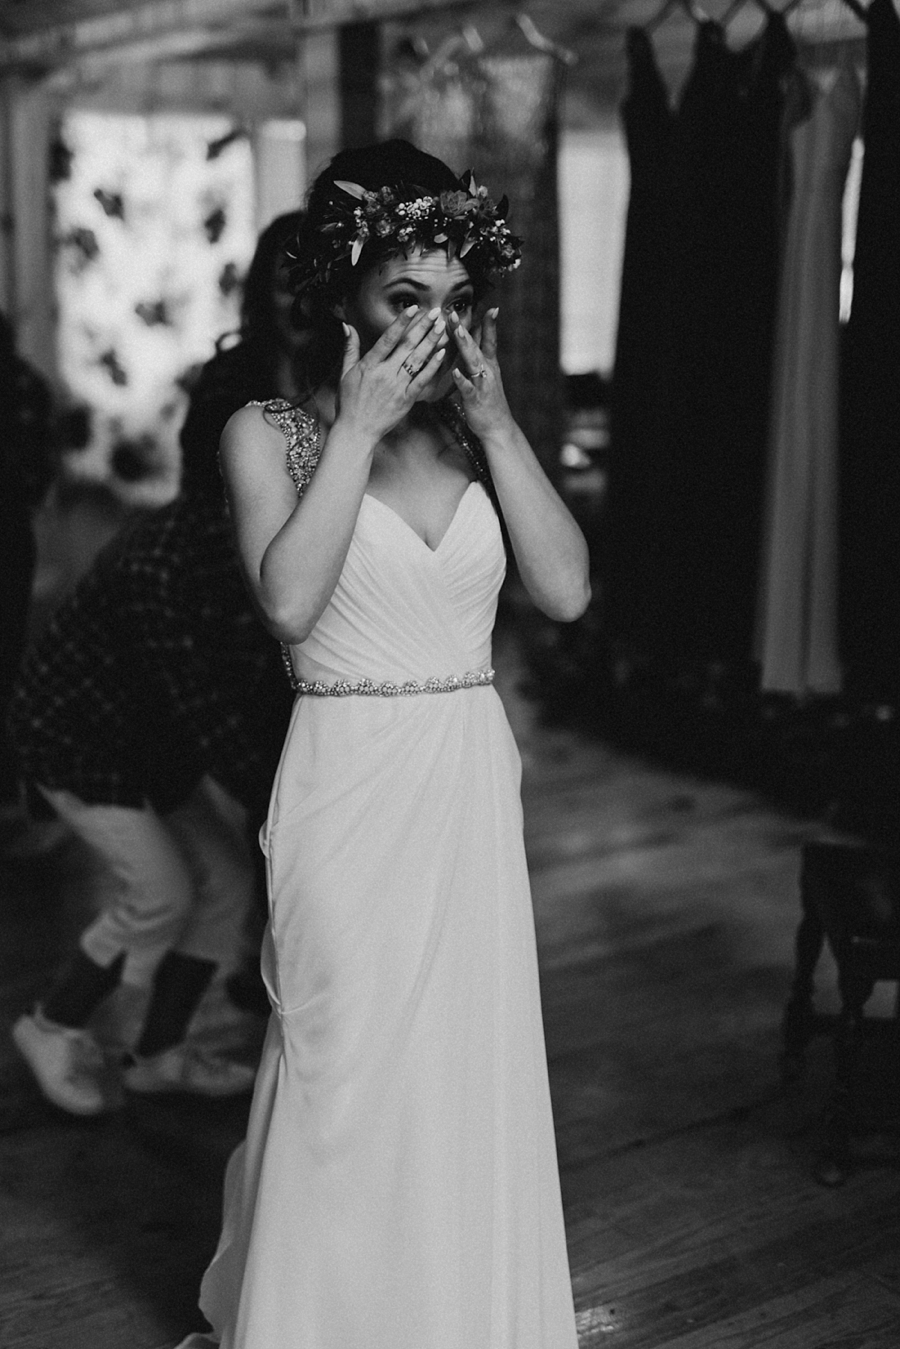 kaihla_tonai_intimate_wedding_elopement_photographer_7282.jpg